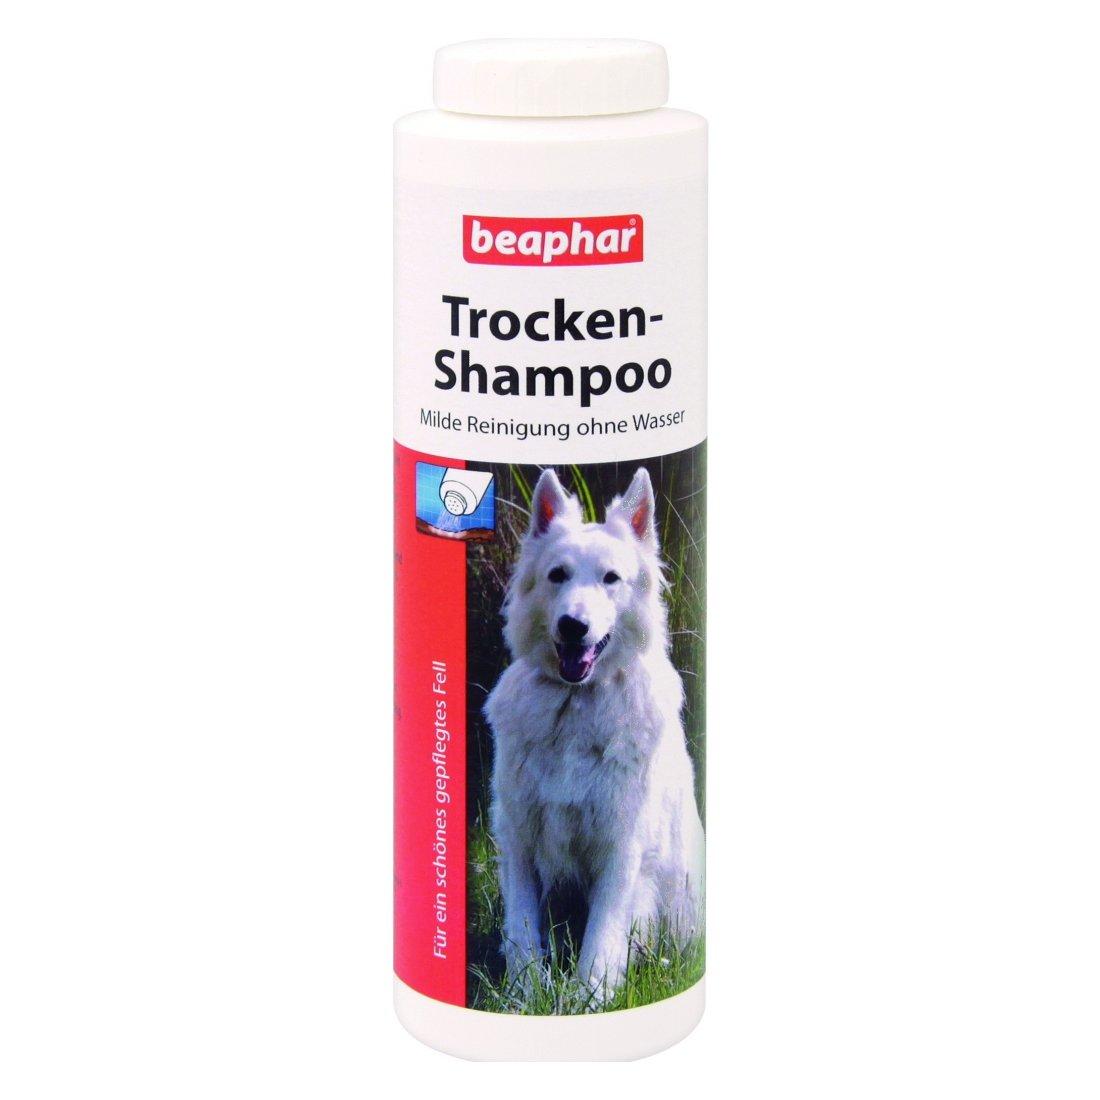 Beaphar Bea Grooming suchý šampon pro psy 100 g